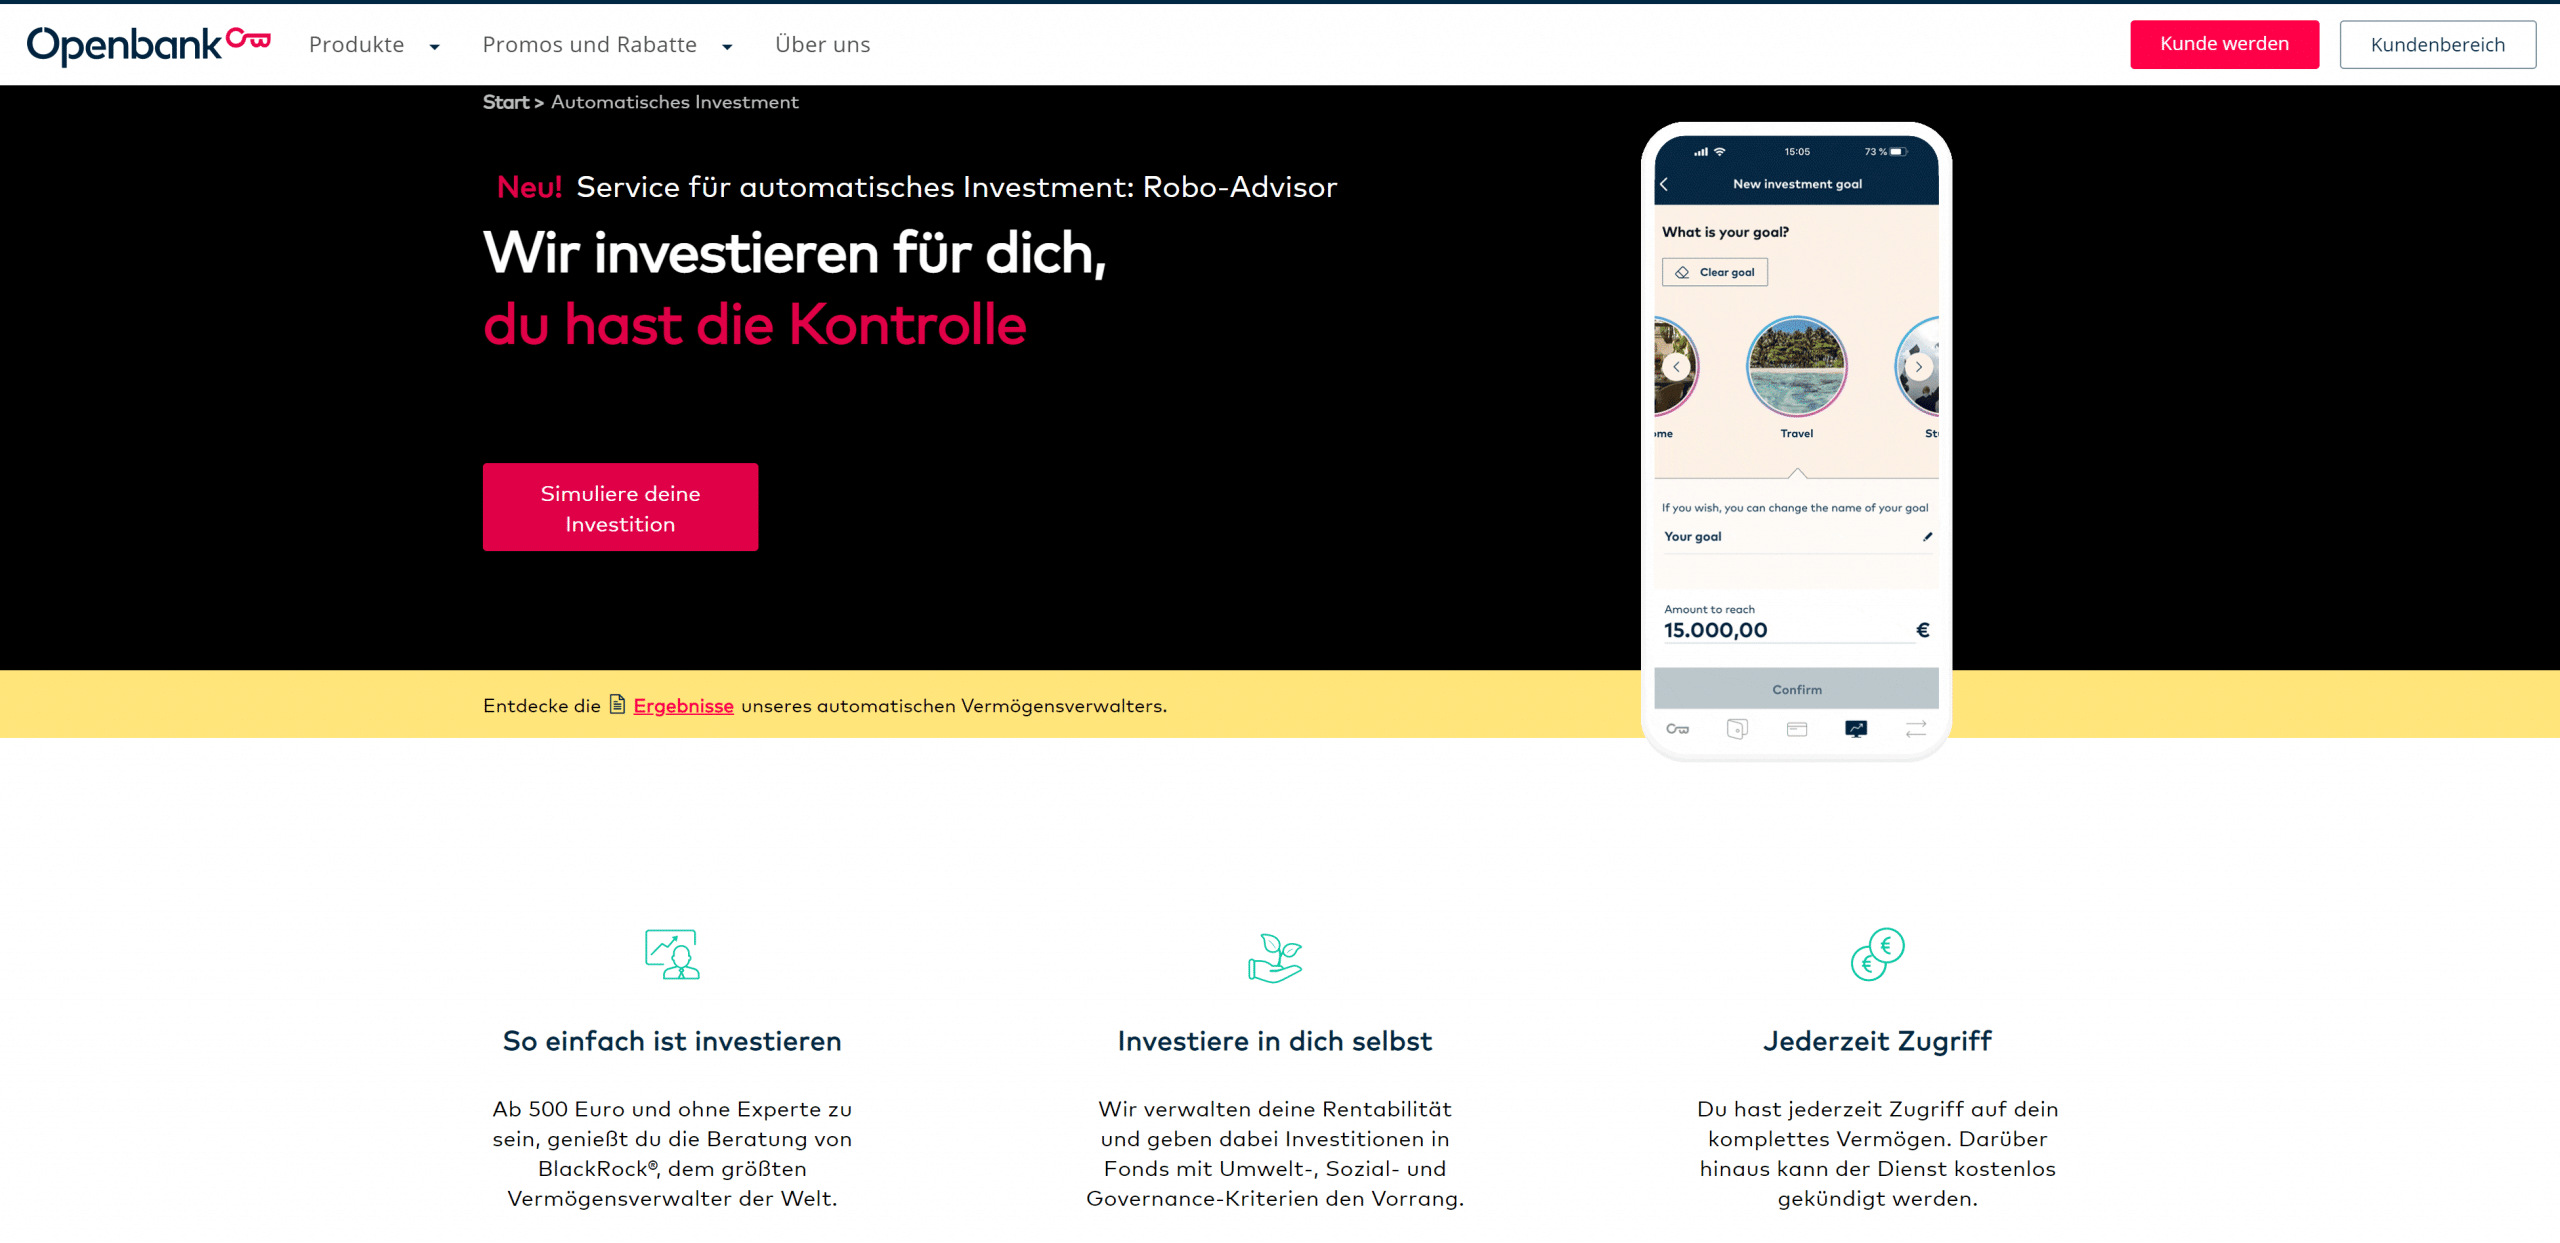 Openbank Robo Advisor Startseite